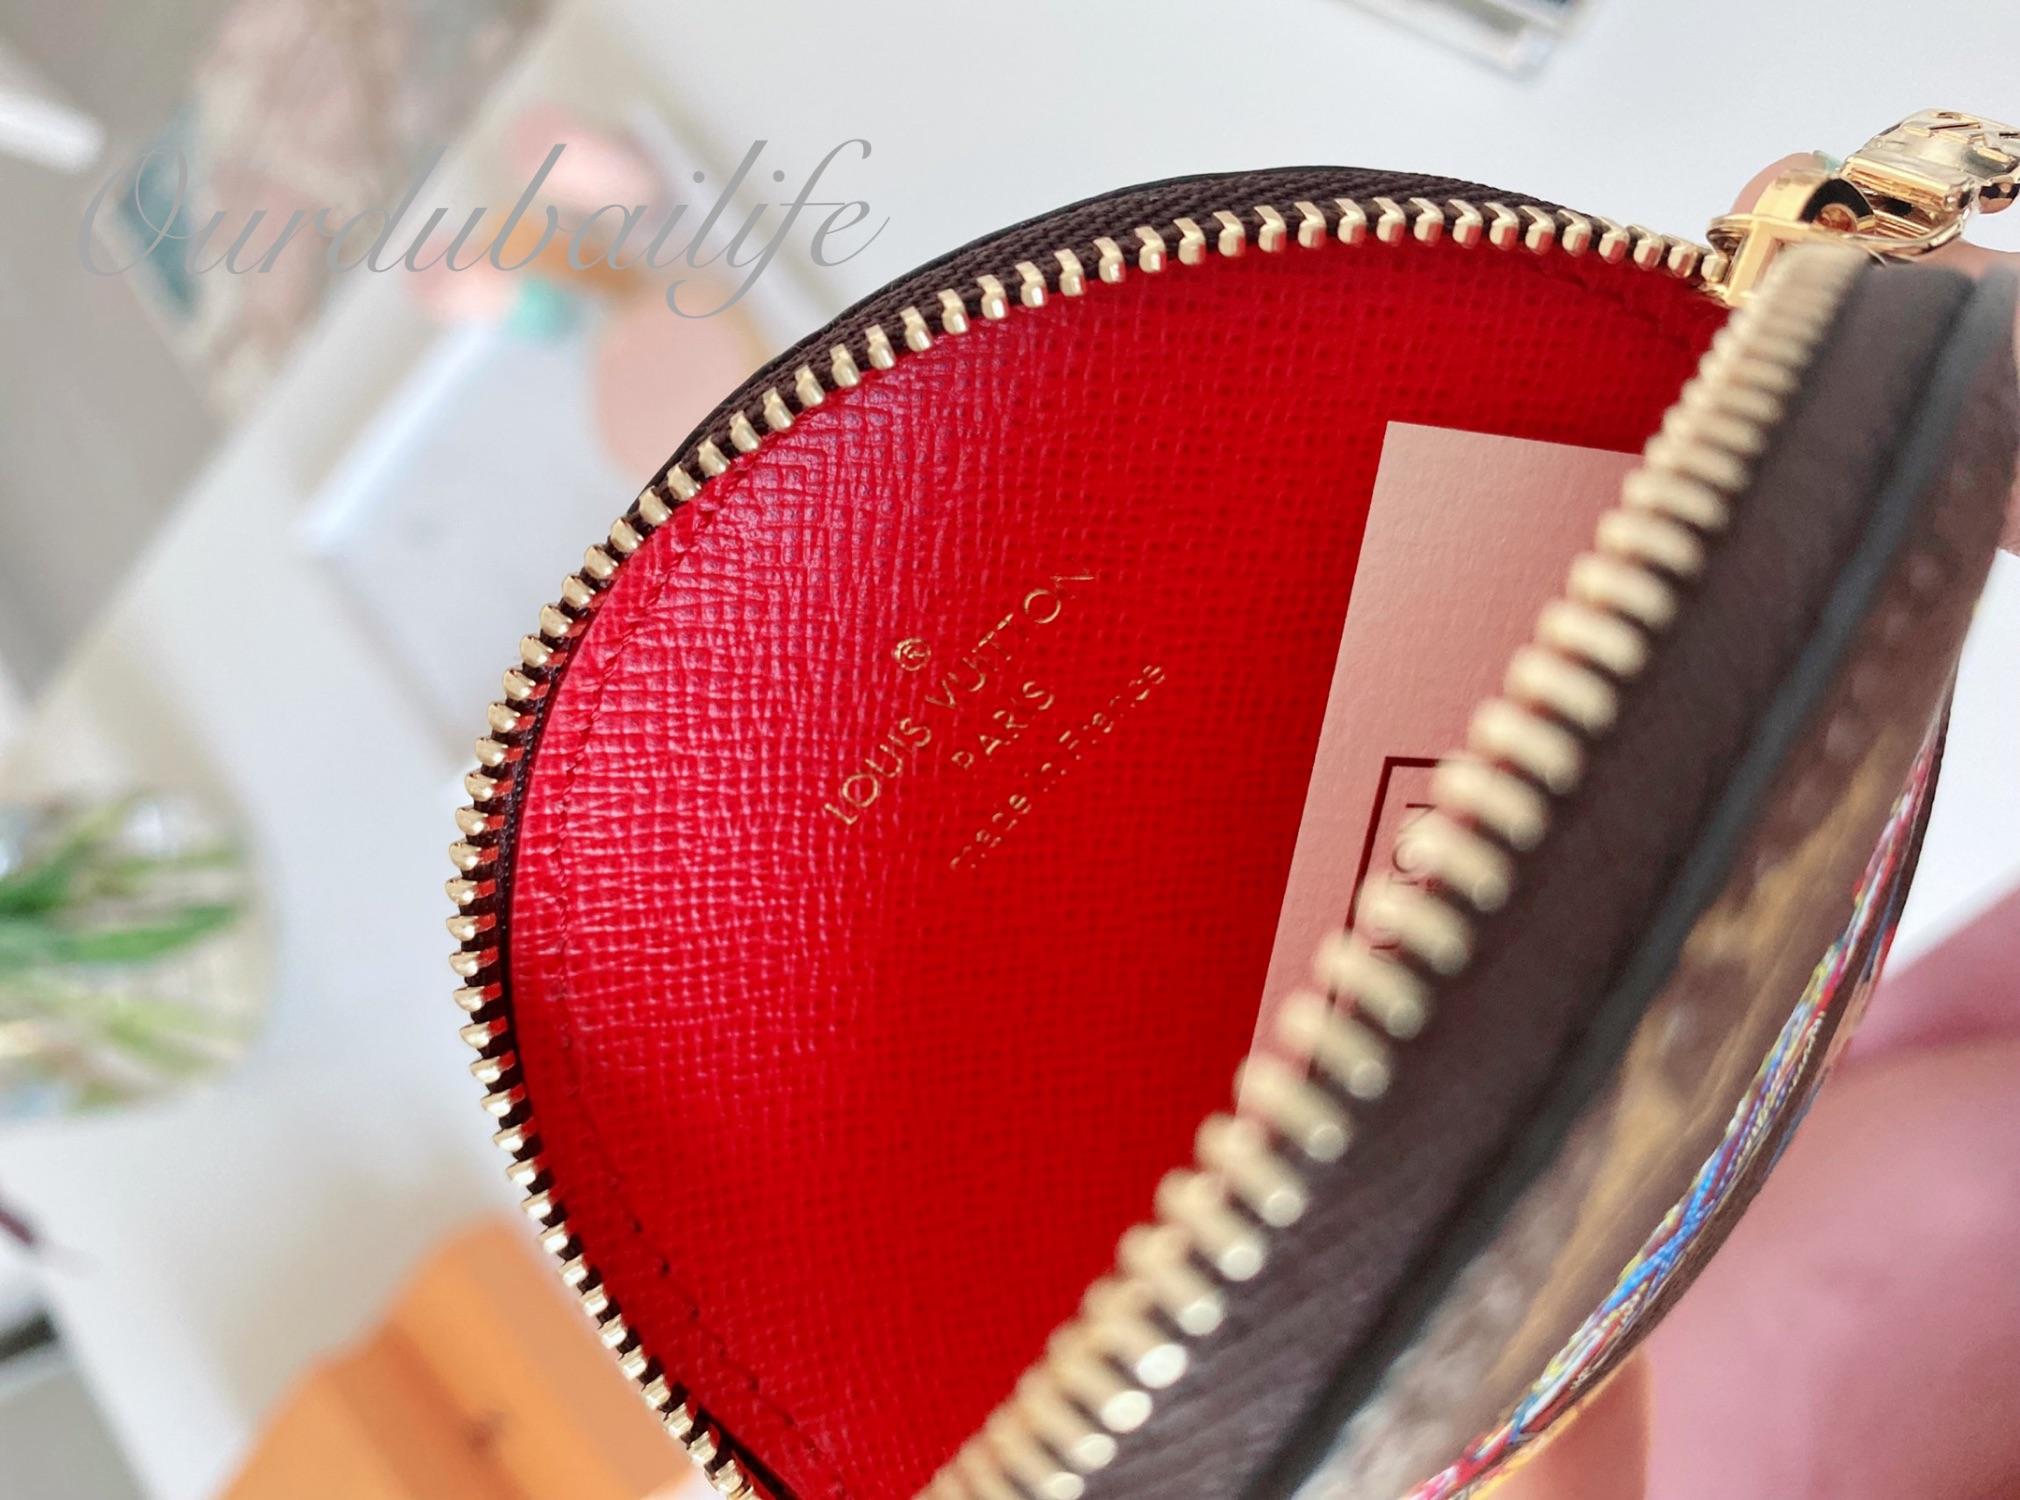 Louis Vuitton Christmas 2020 Bumper car round coin purse